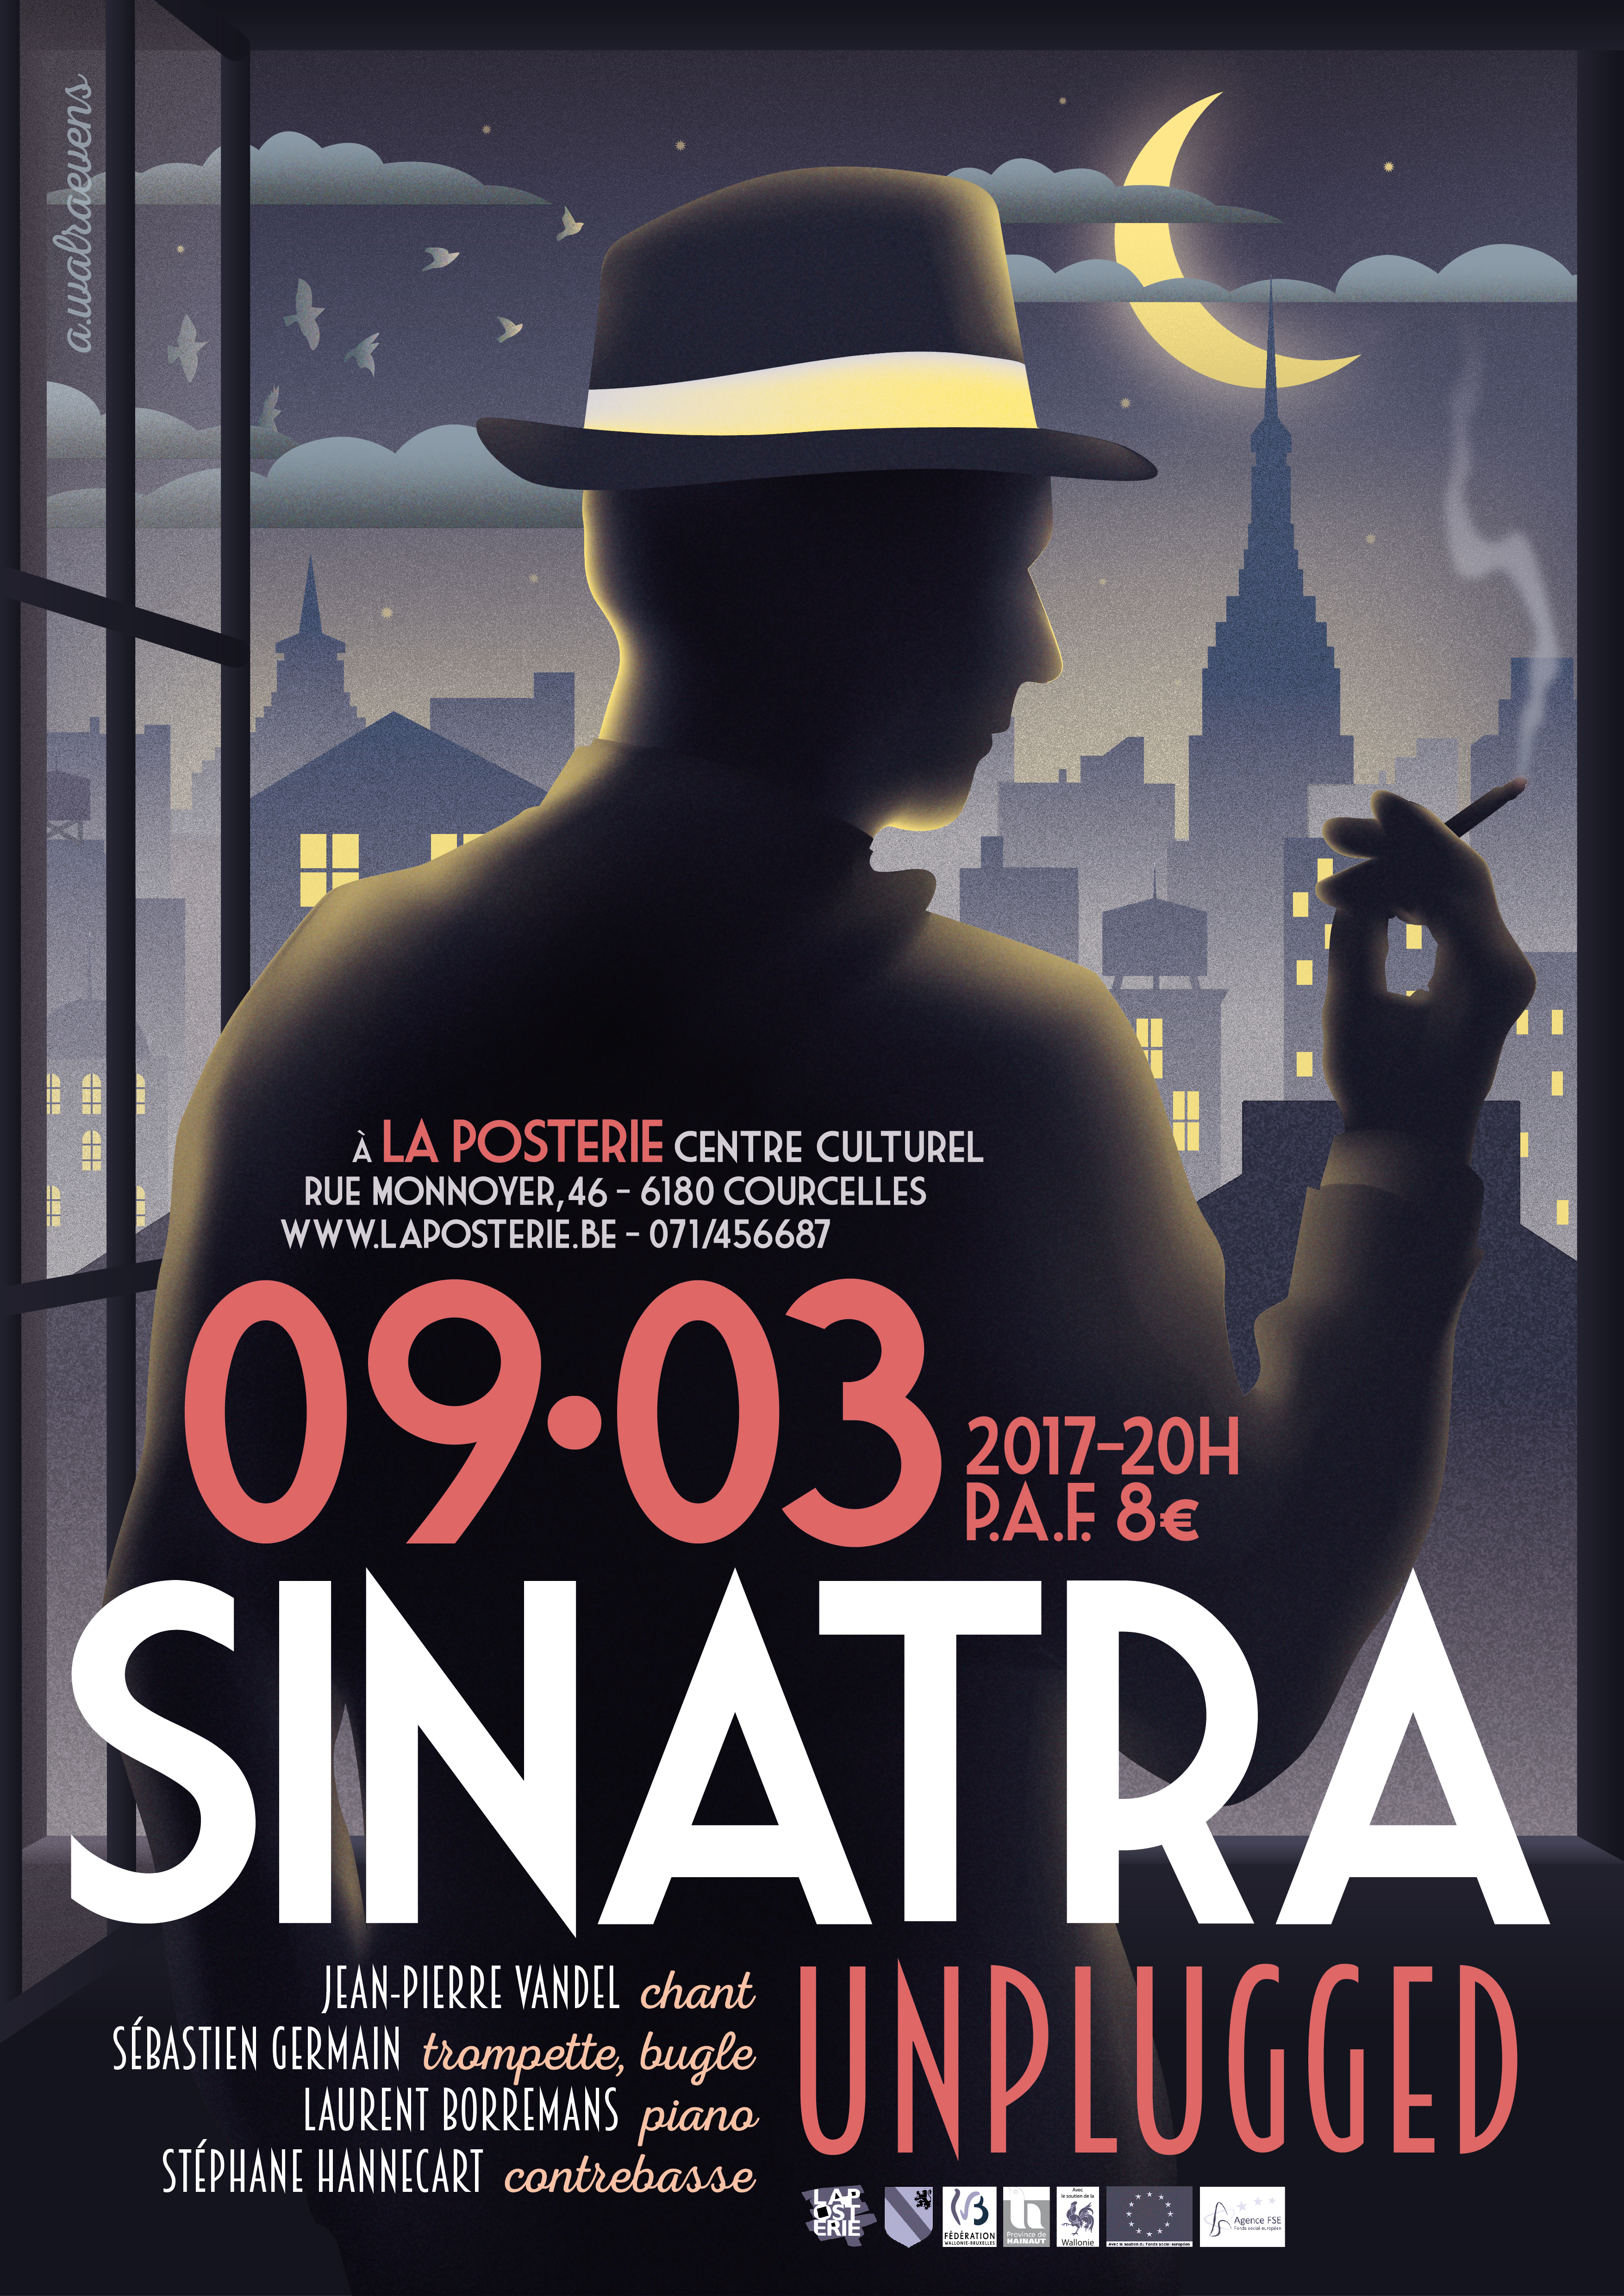 Sinatra Unplugged